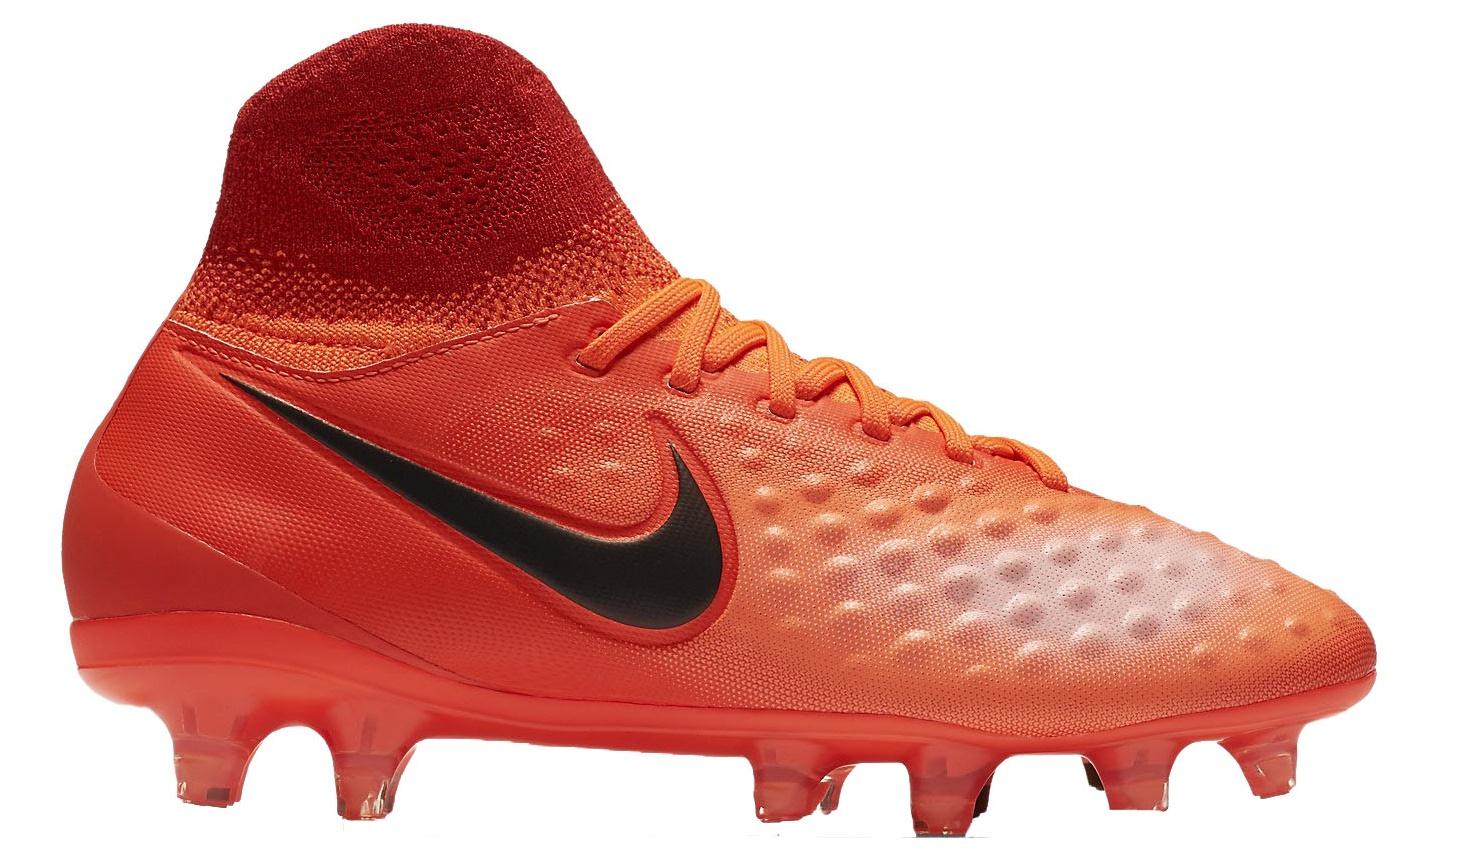 Scarpe Calcio Bambino Nike Magista Obra II FG Radiation Flare Pack